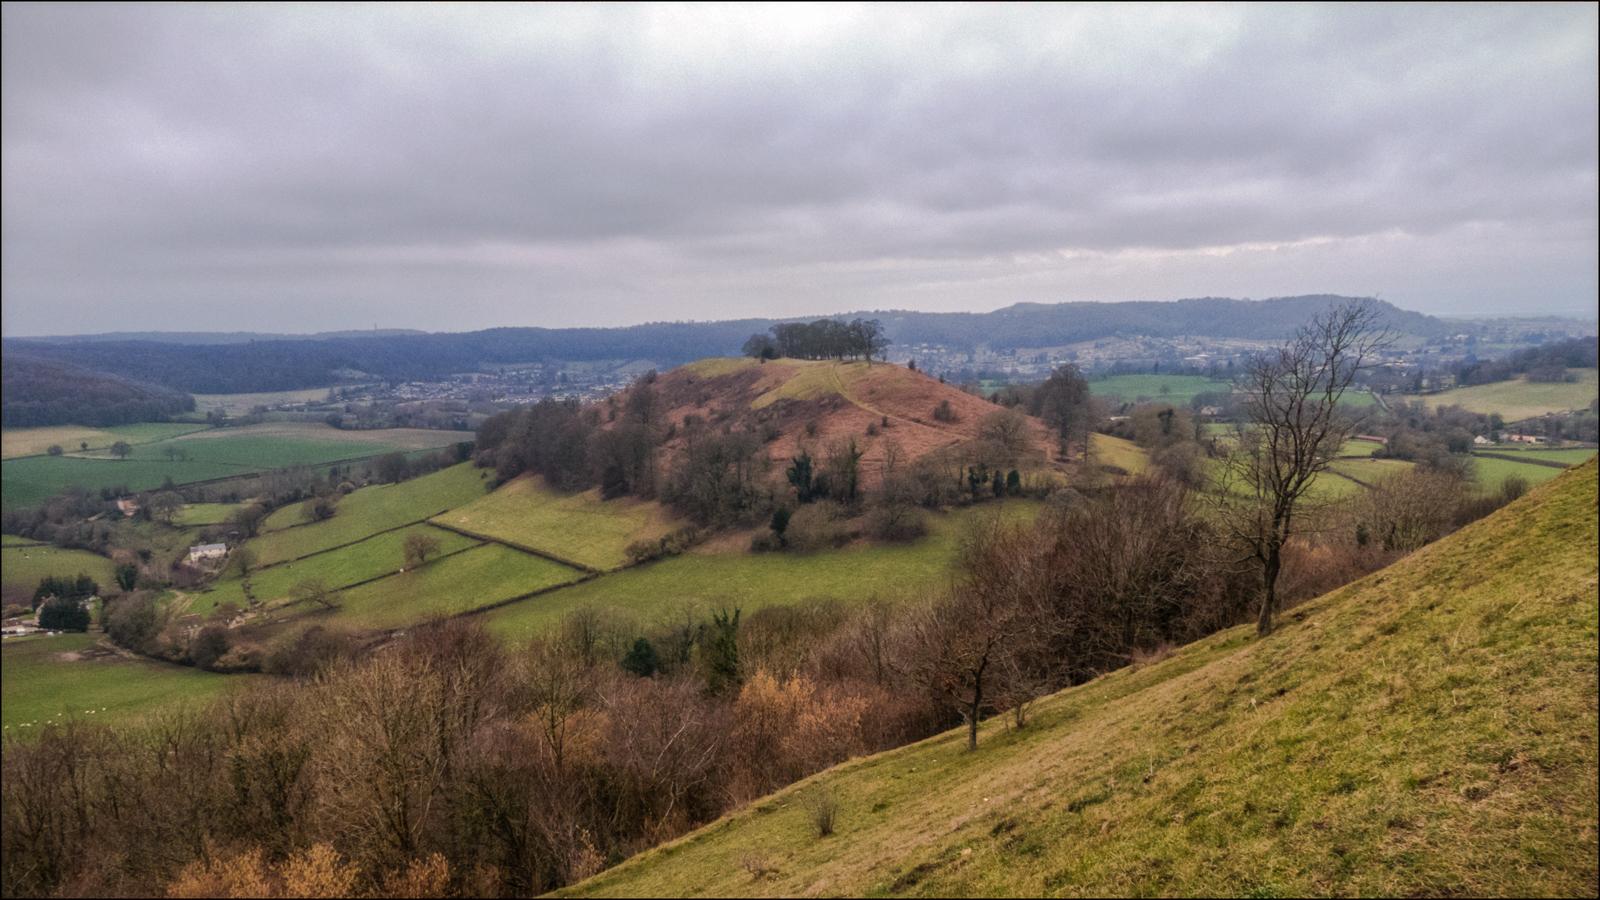 View of Smallpox Hill